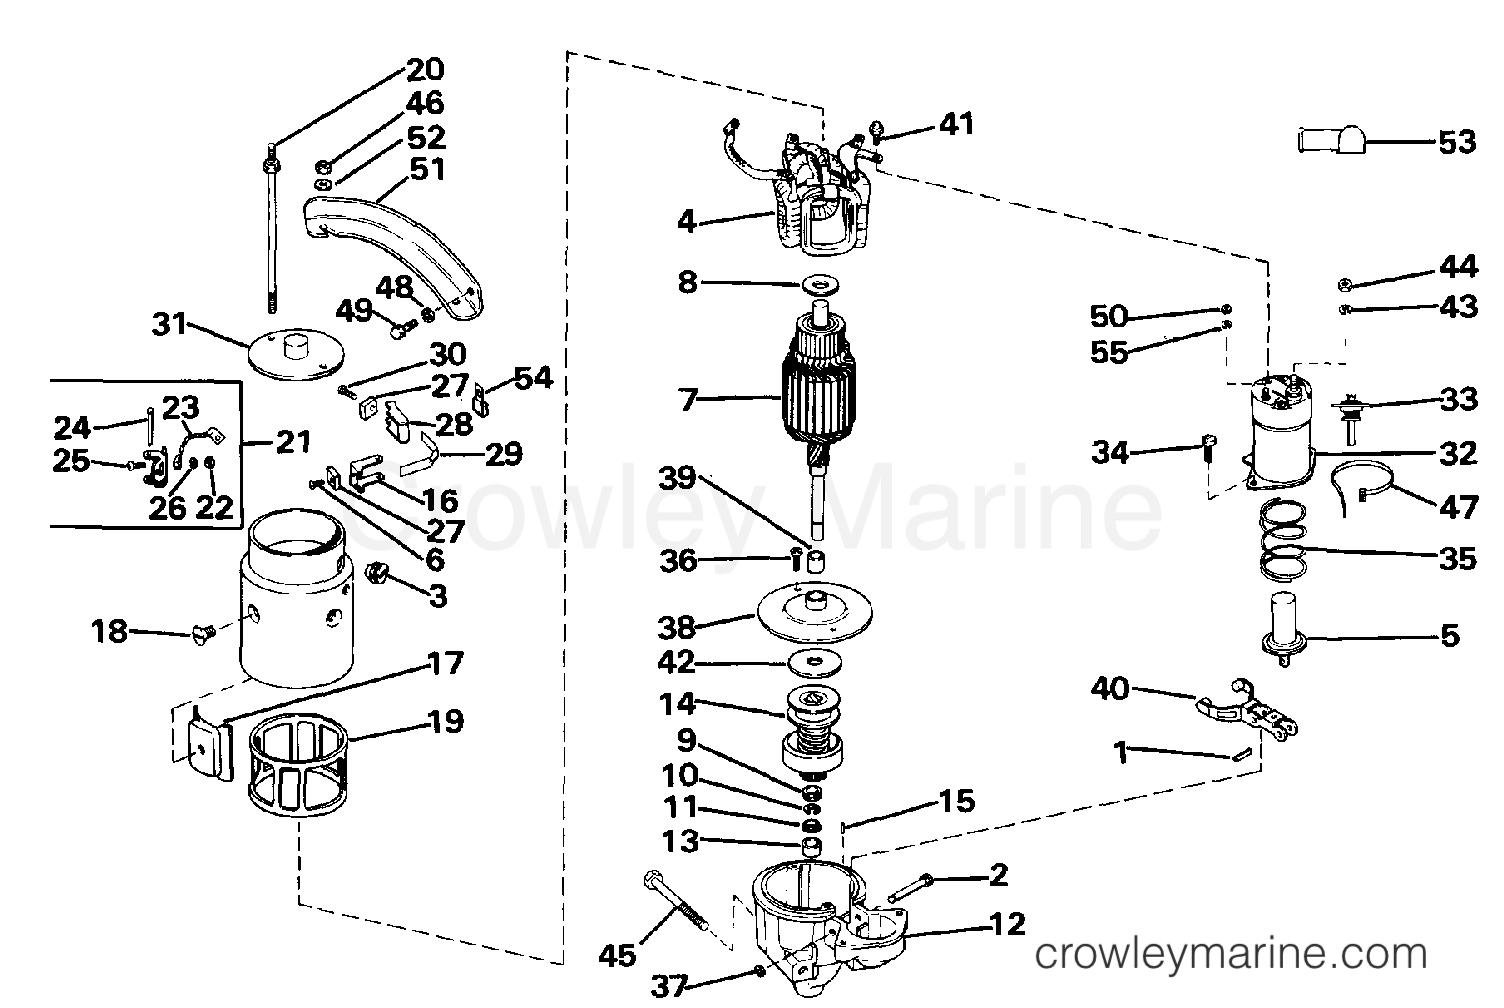 Omc Engine Diagram - Wiring Diagrams on